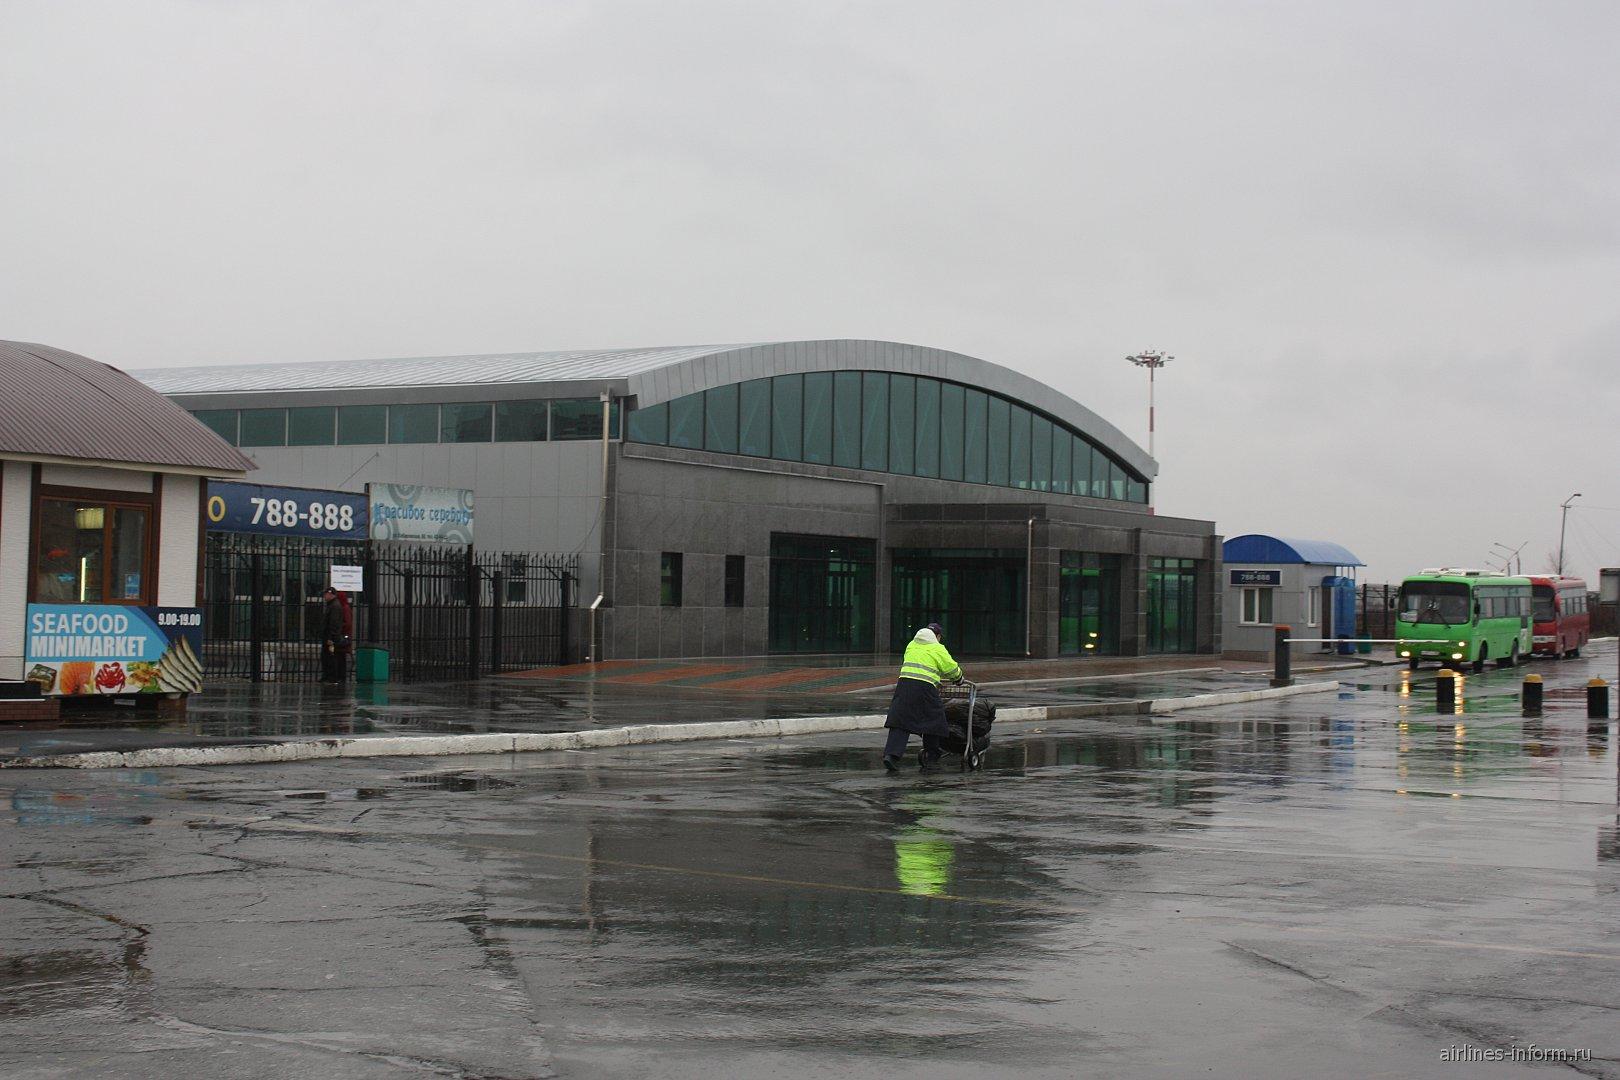 Терминал выдачи багажа в аэропорту Южно-Сахалинск Хомутово